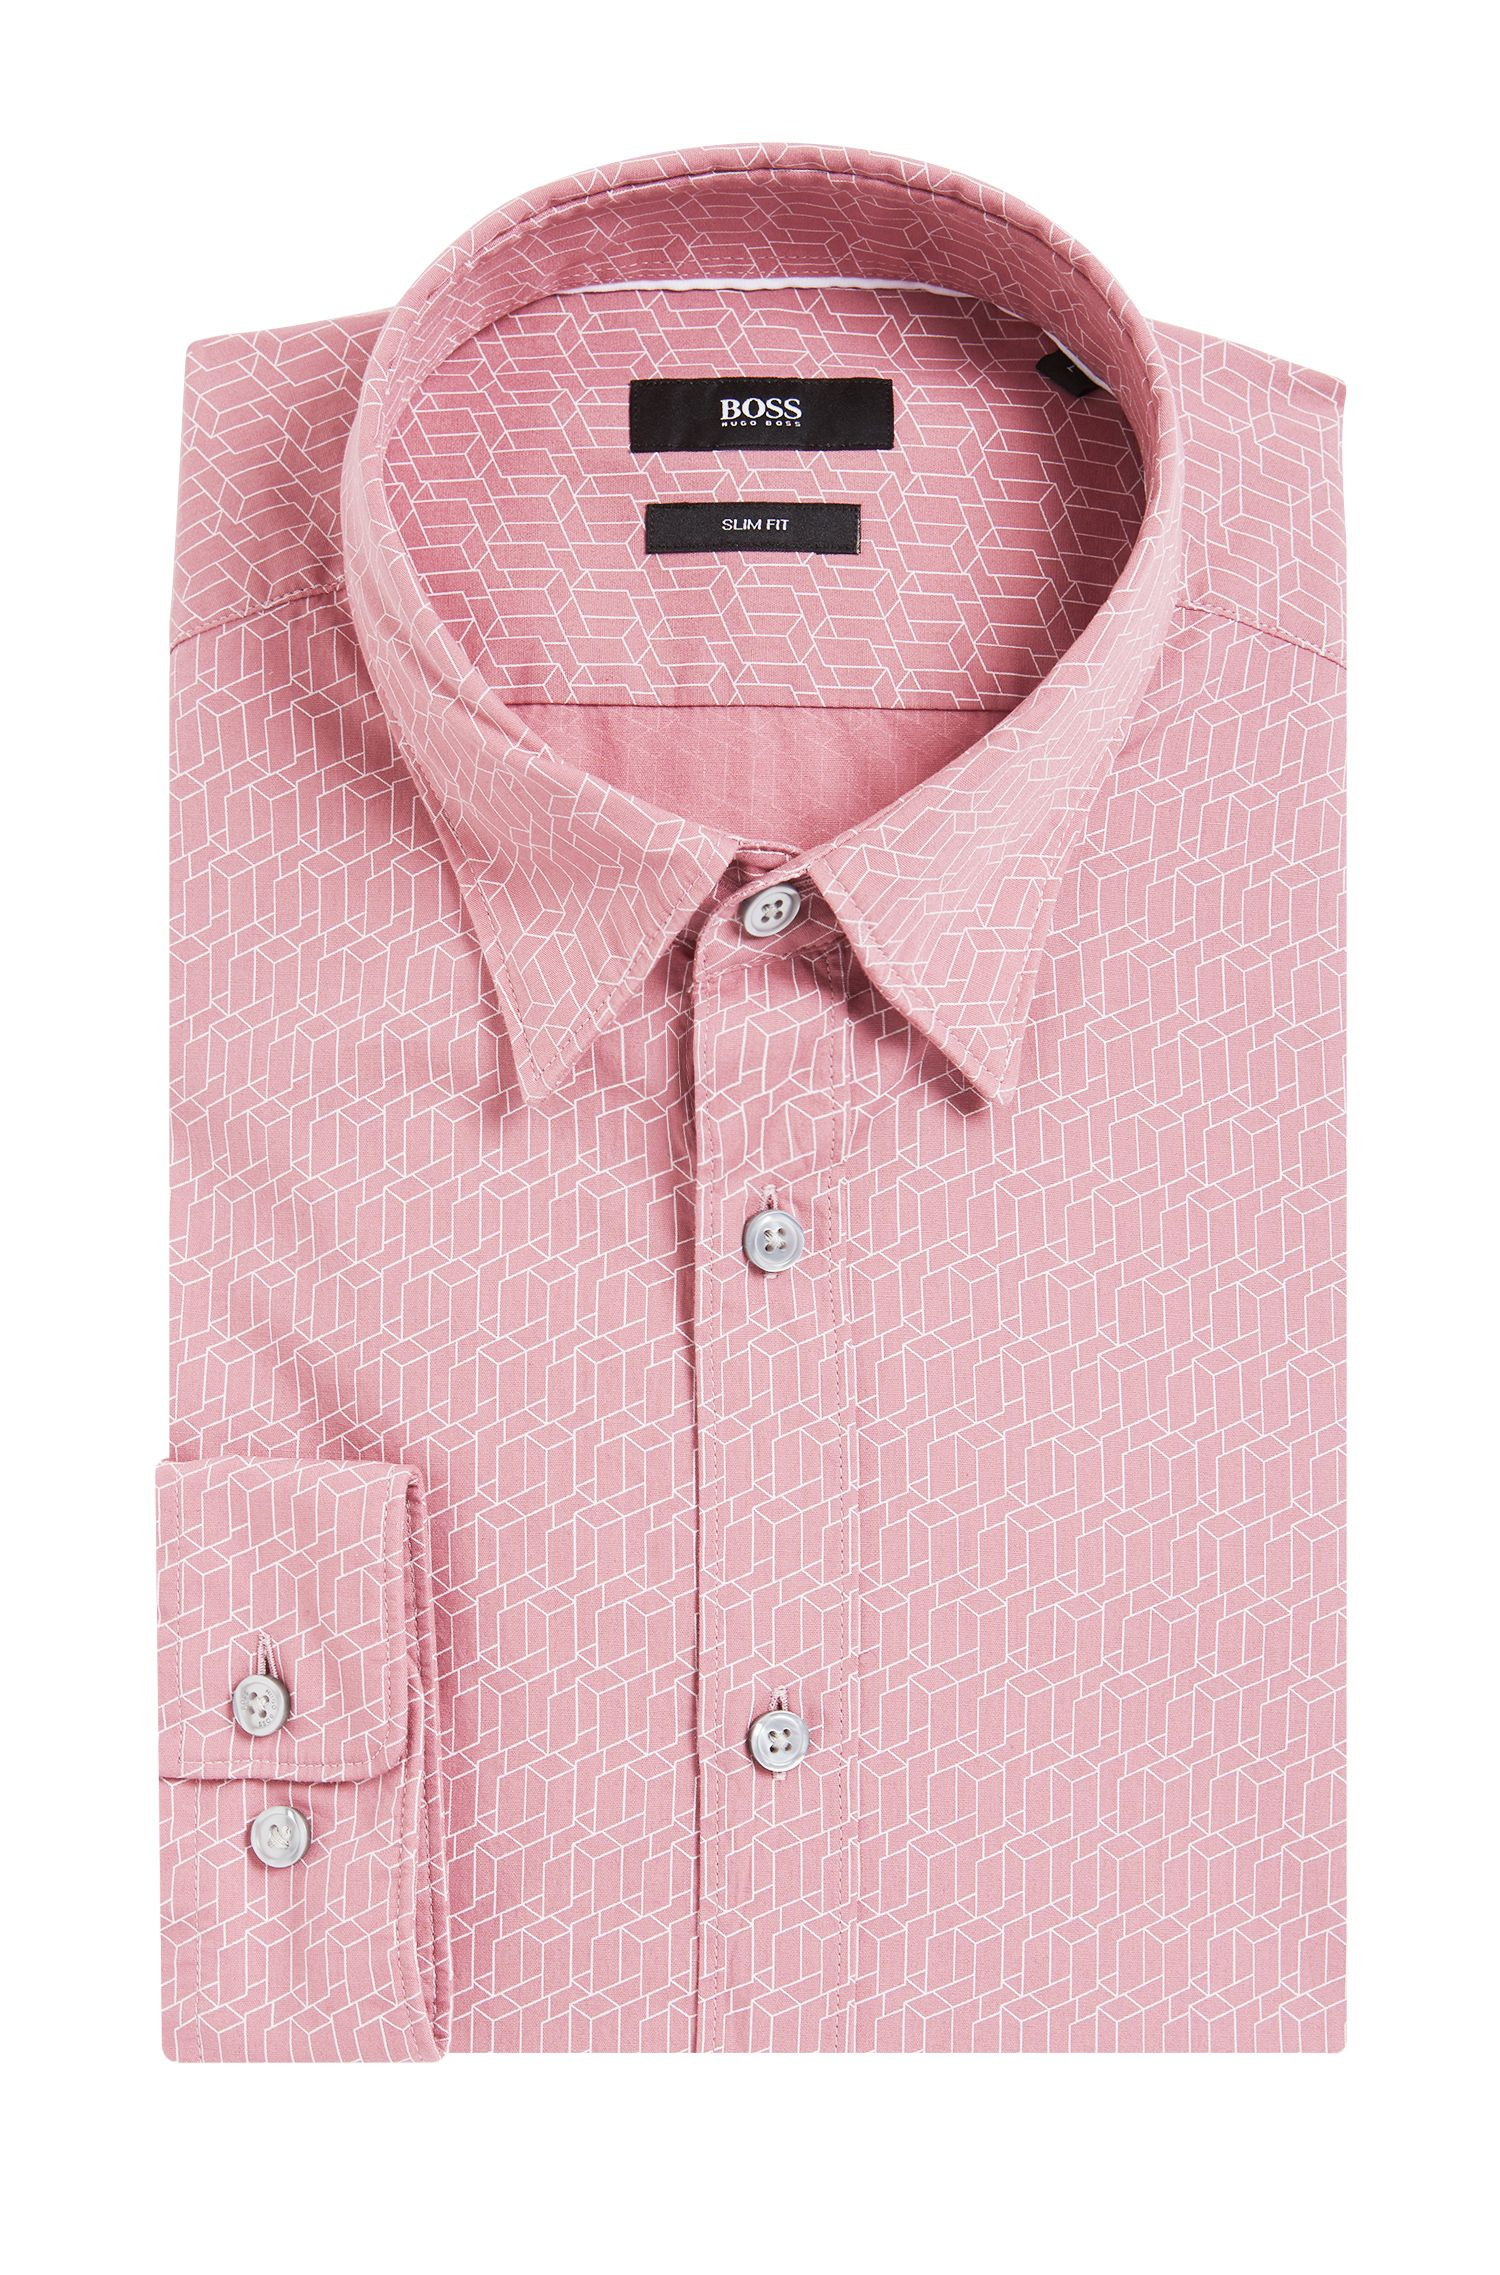 Geo-Print Italian Cotton Button Down Shirt, Slim Fit | Rodney